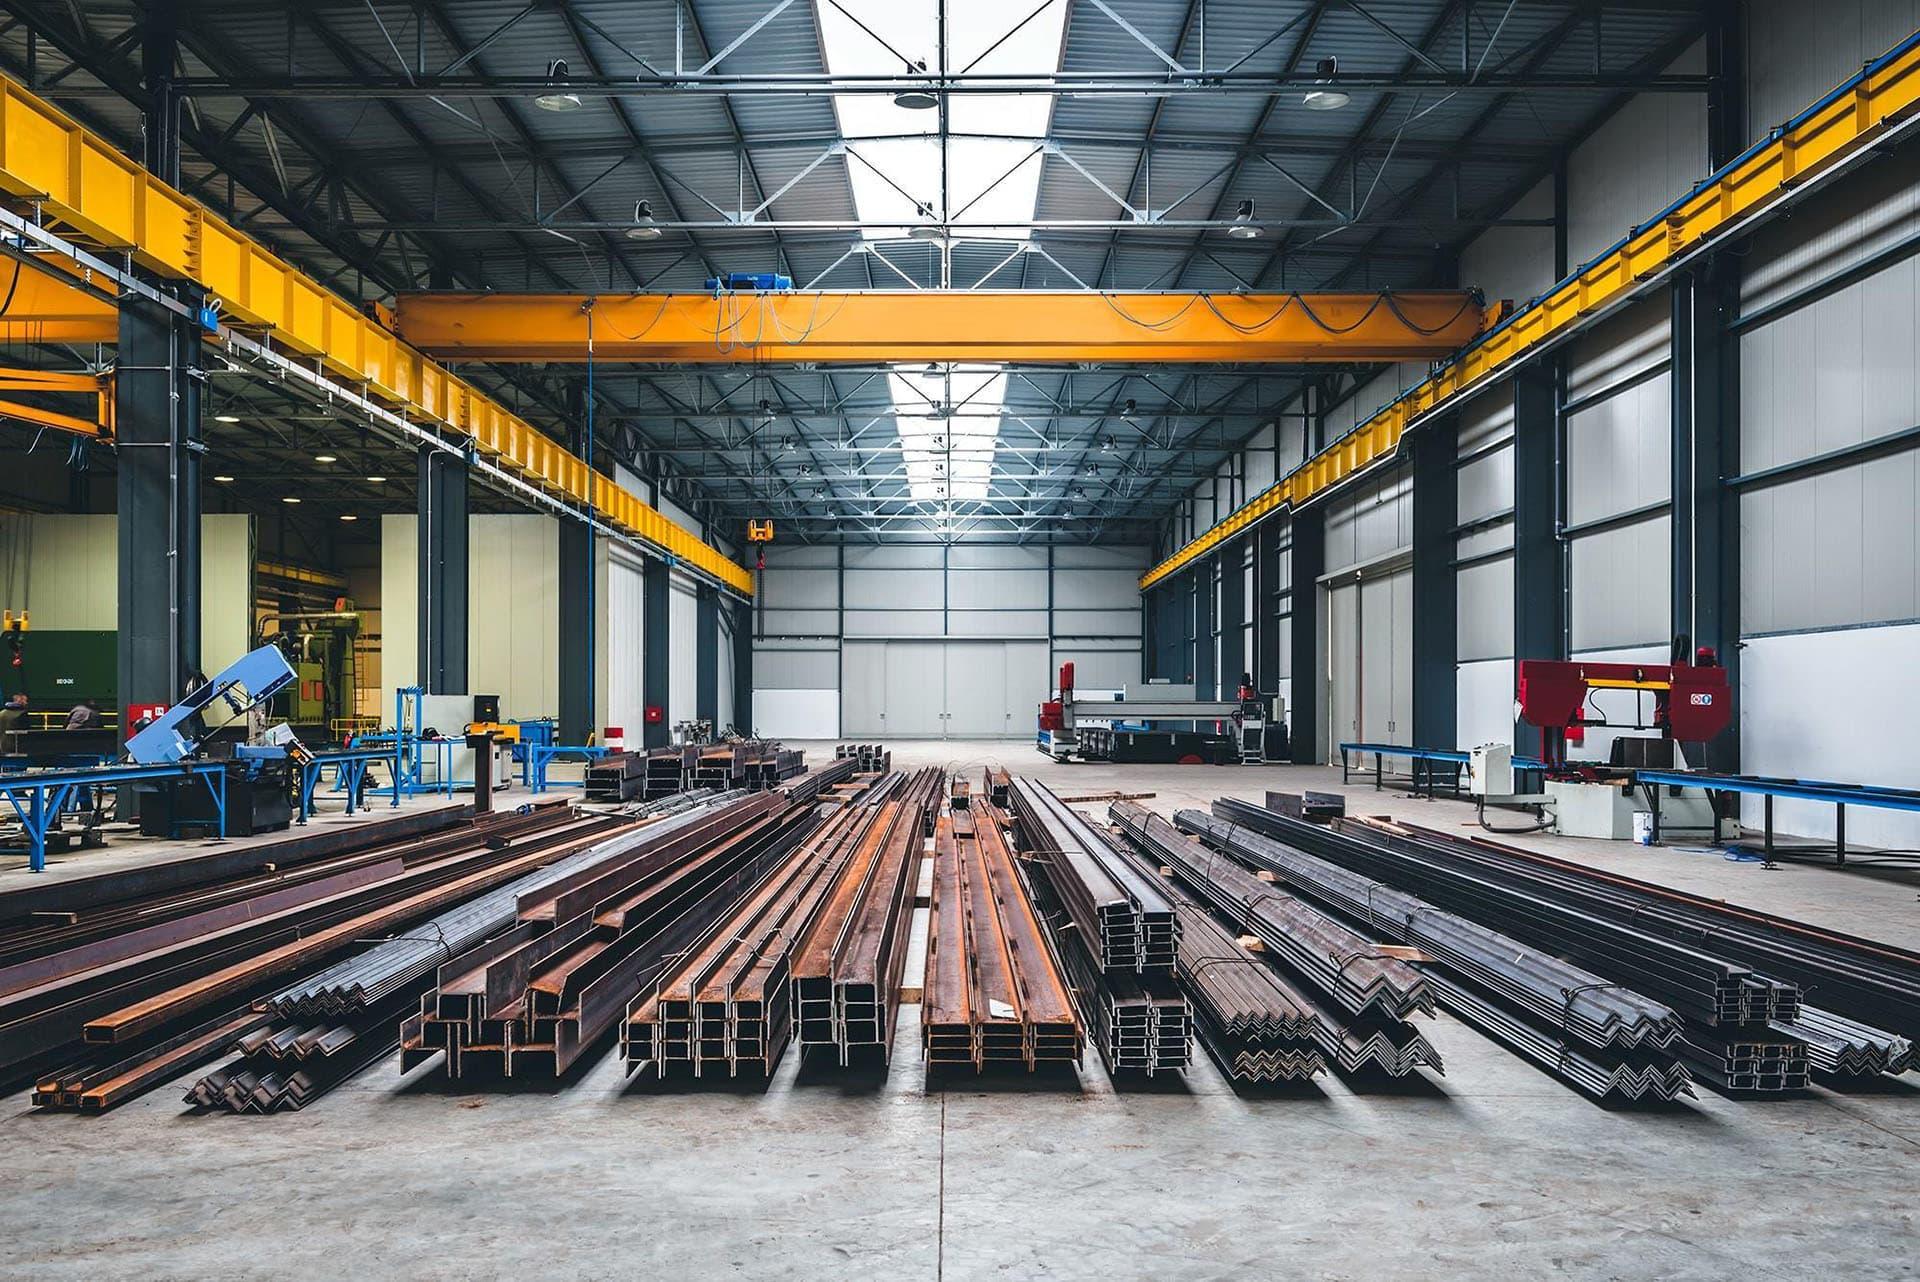 Industrial steel building used for storage